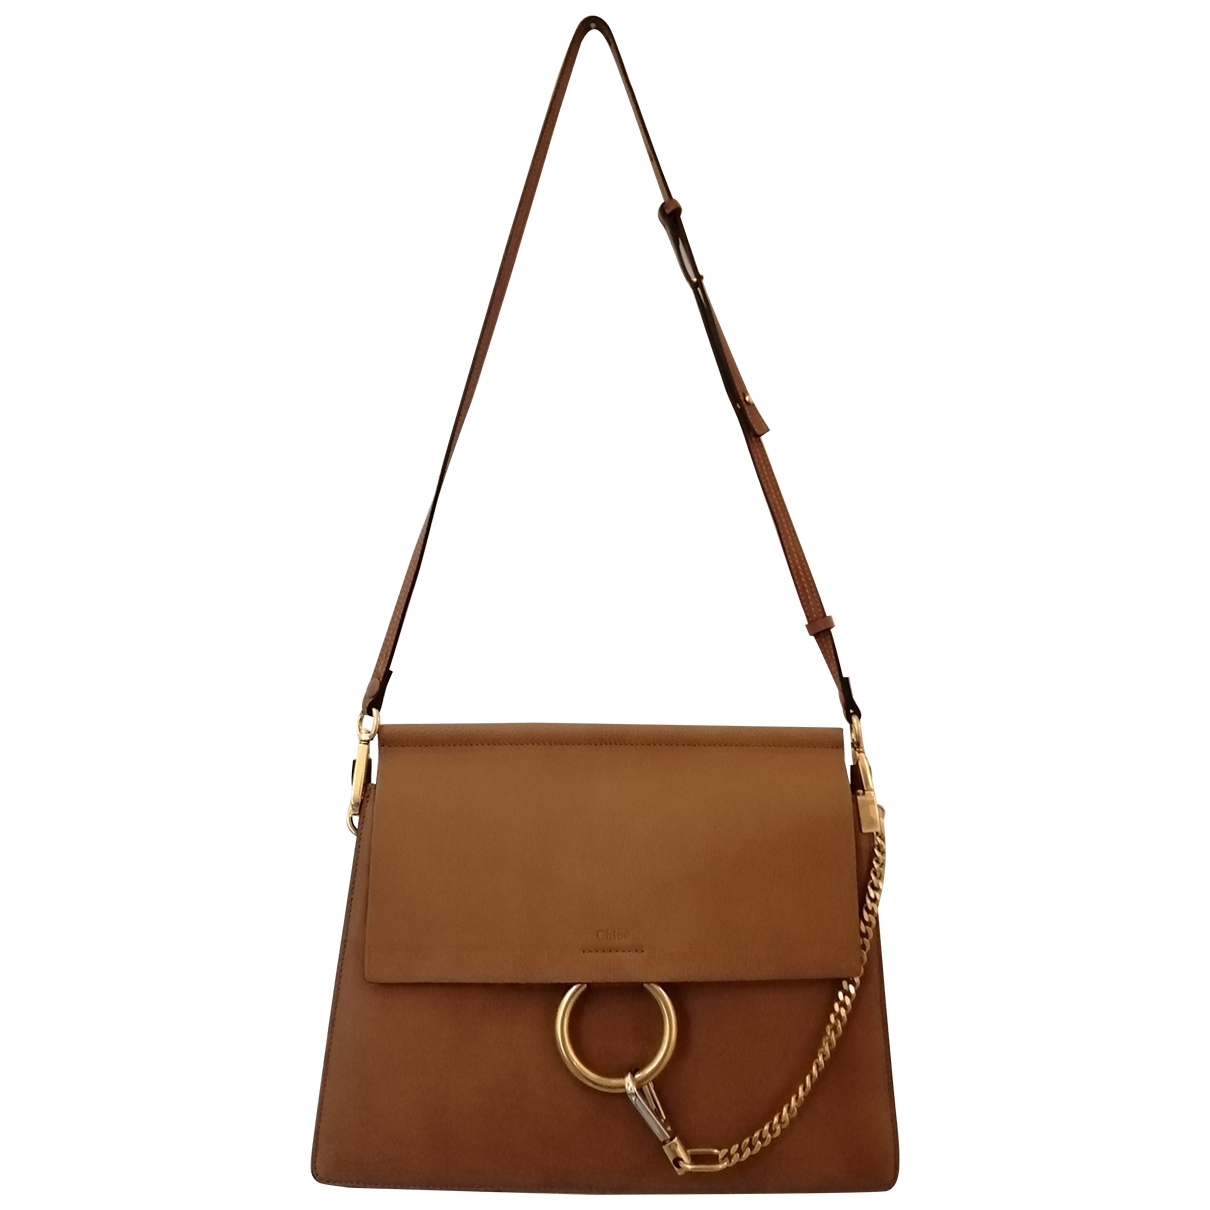 Chloé Faye Camel Leather handbag for Women \N